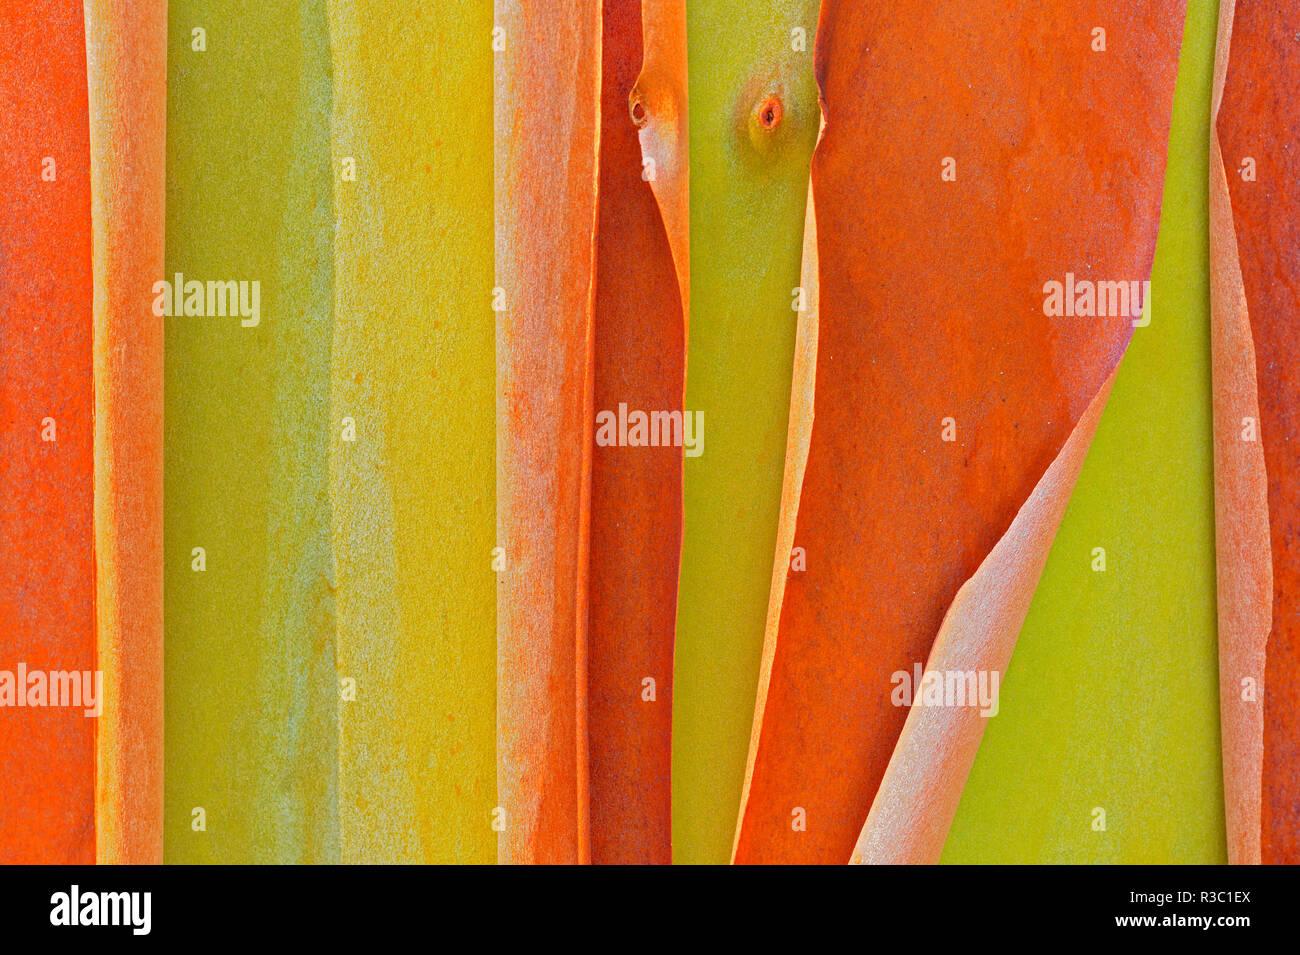 Kanada, British Columbia, Saltspring Island. Abblätternde Rinde von Arbutus Baum. Stockbild